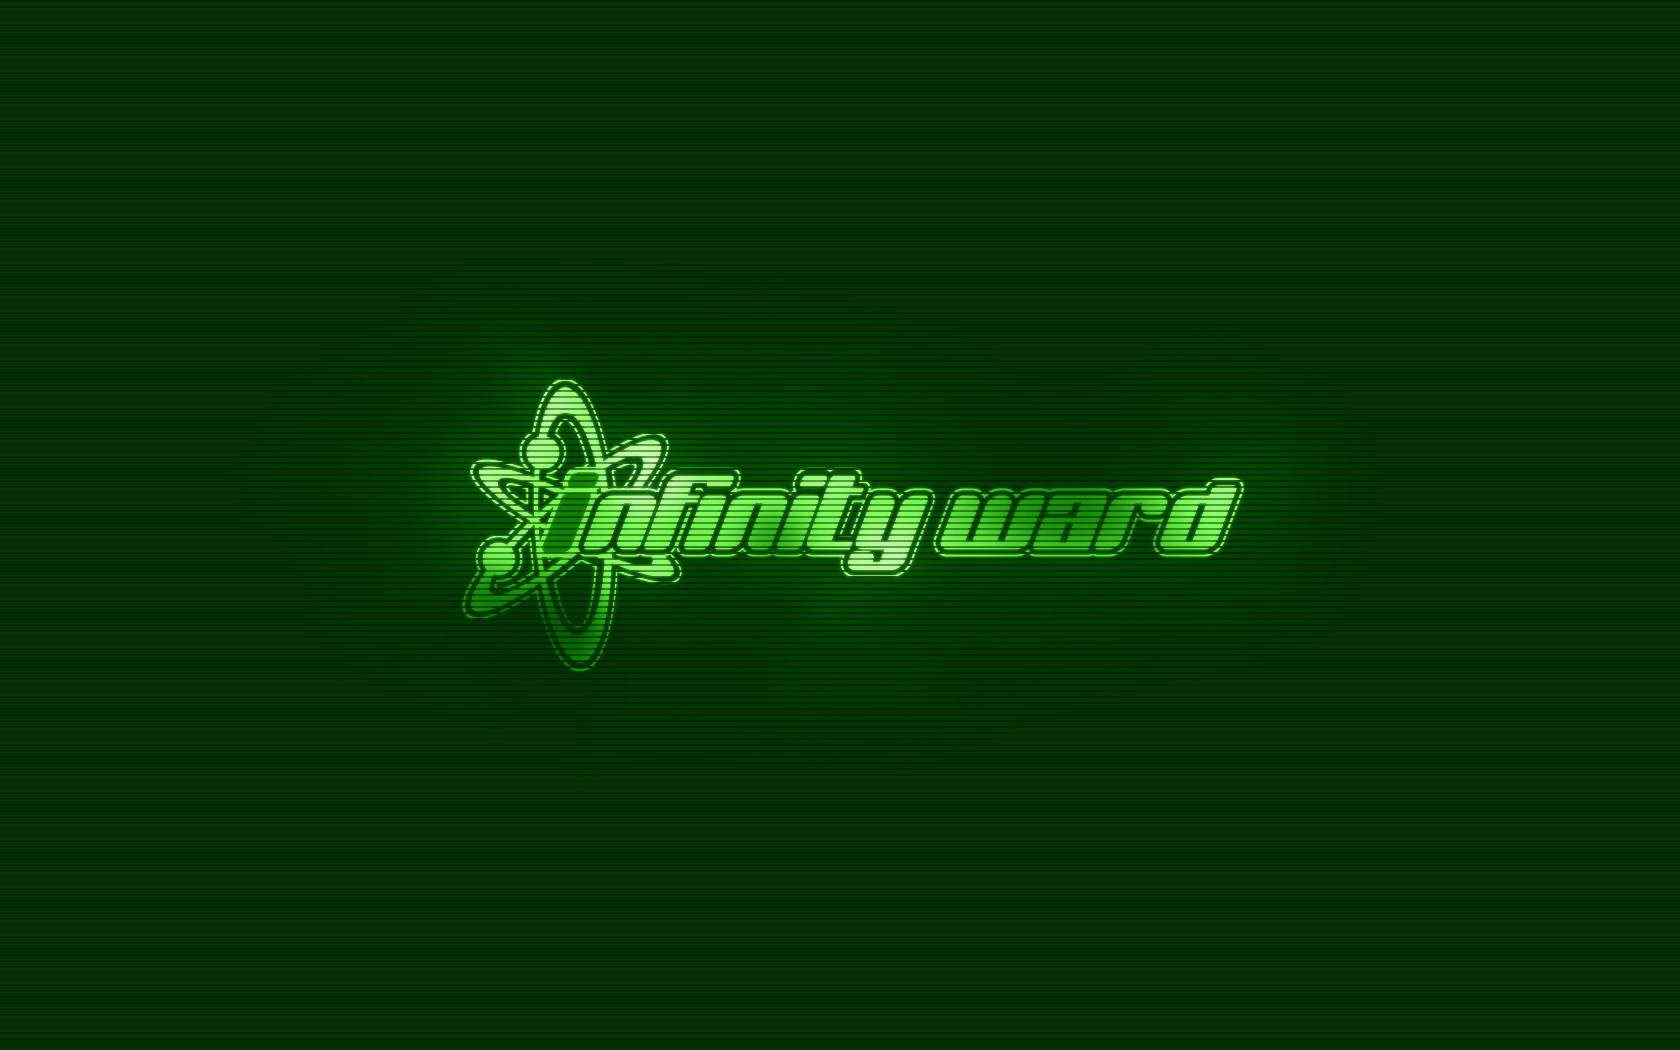 Infinity Ward Logo Wallpaper